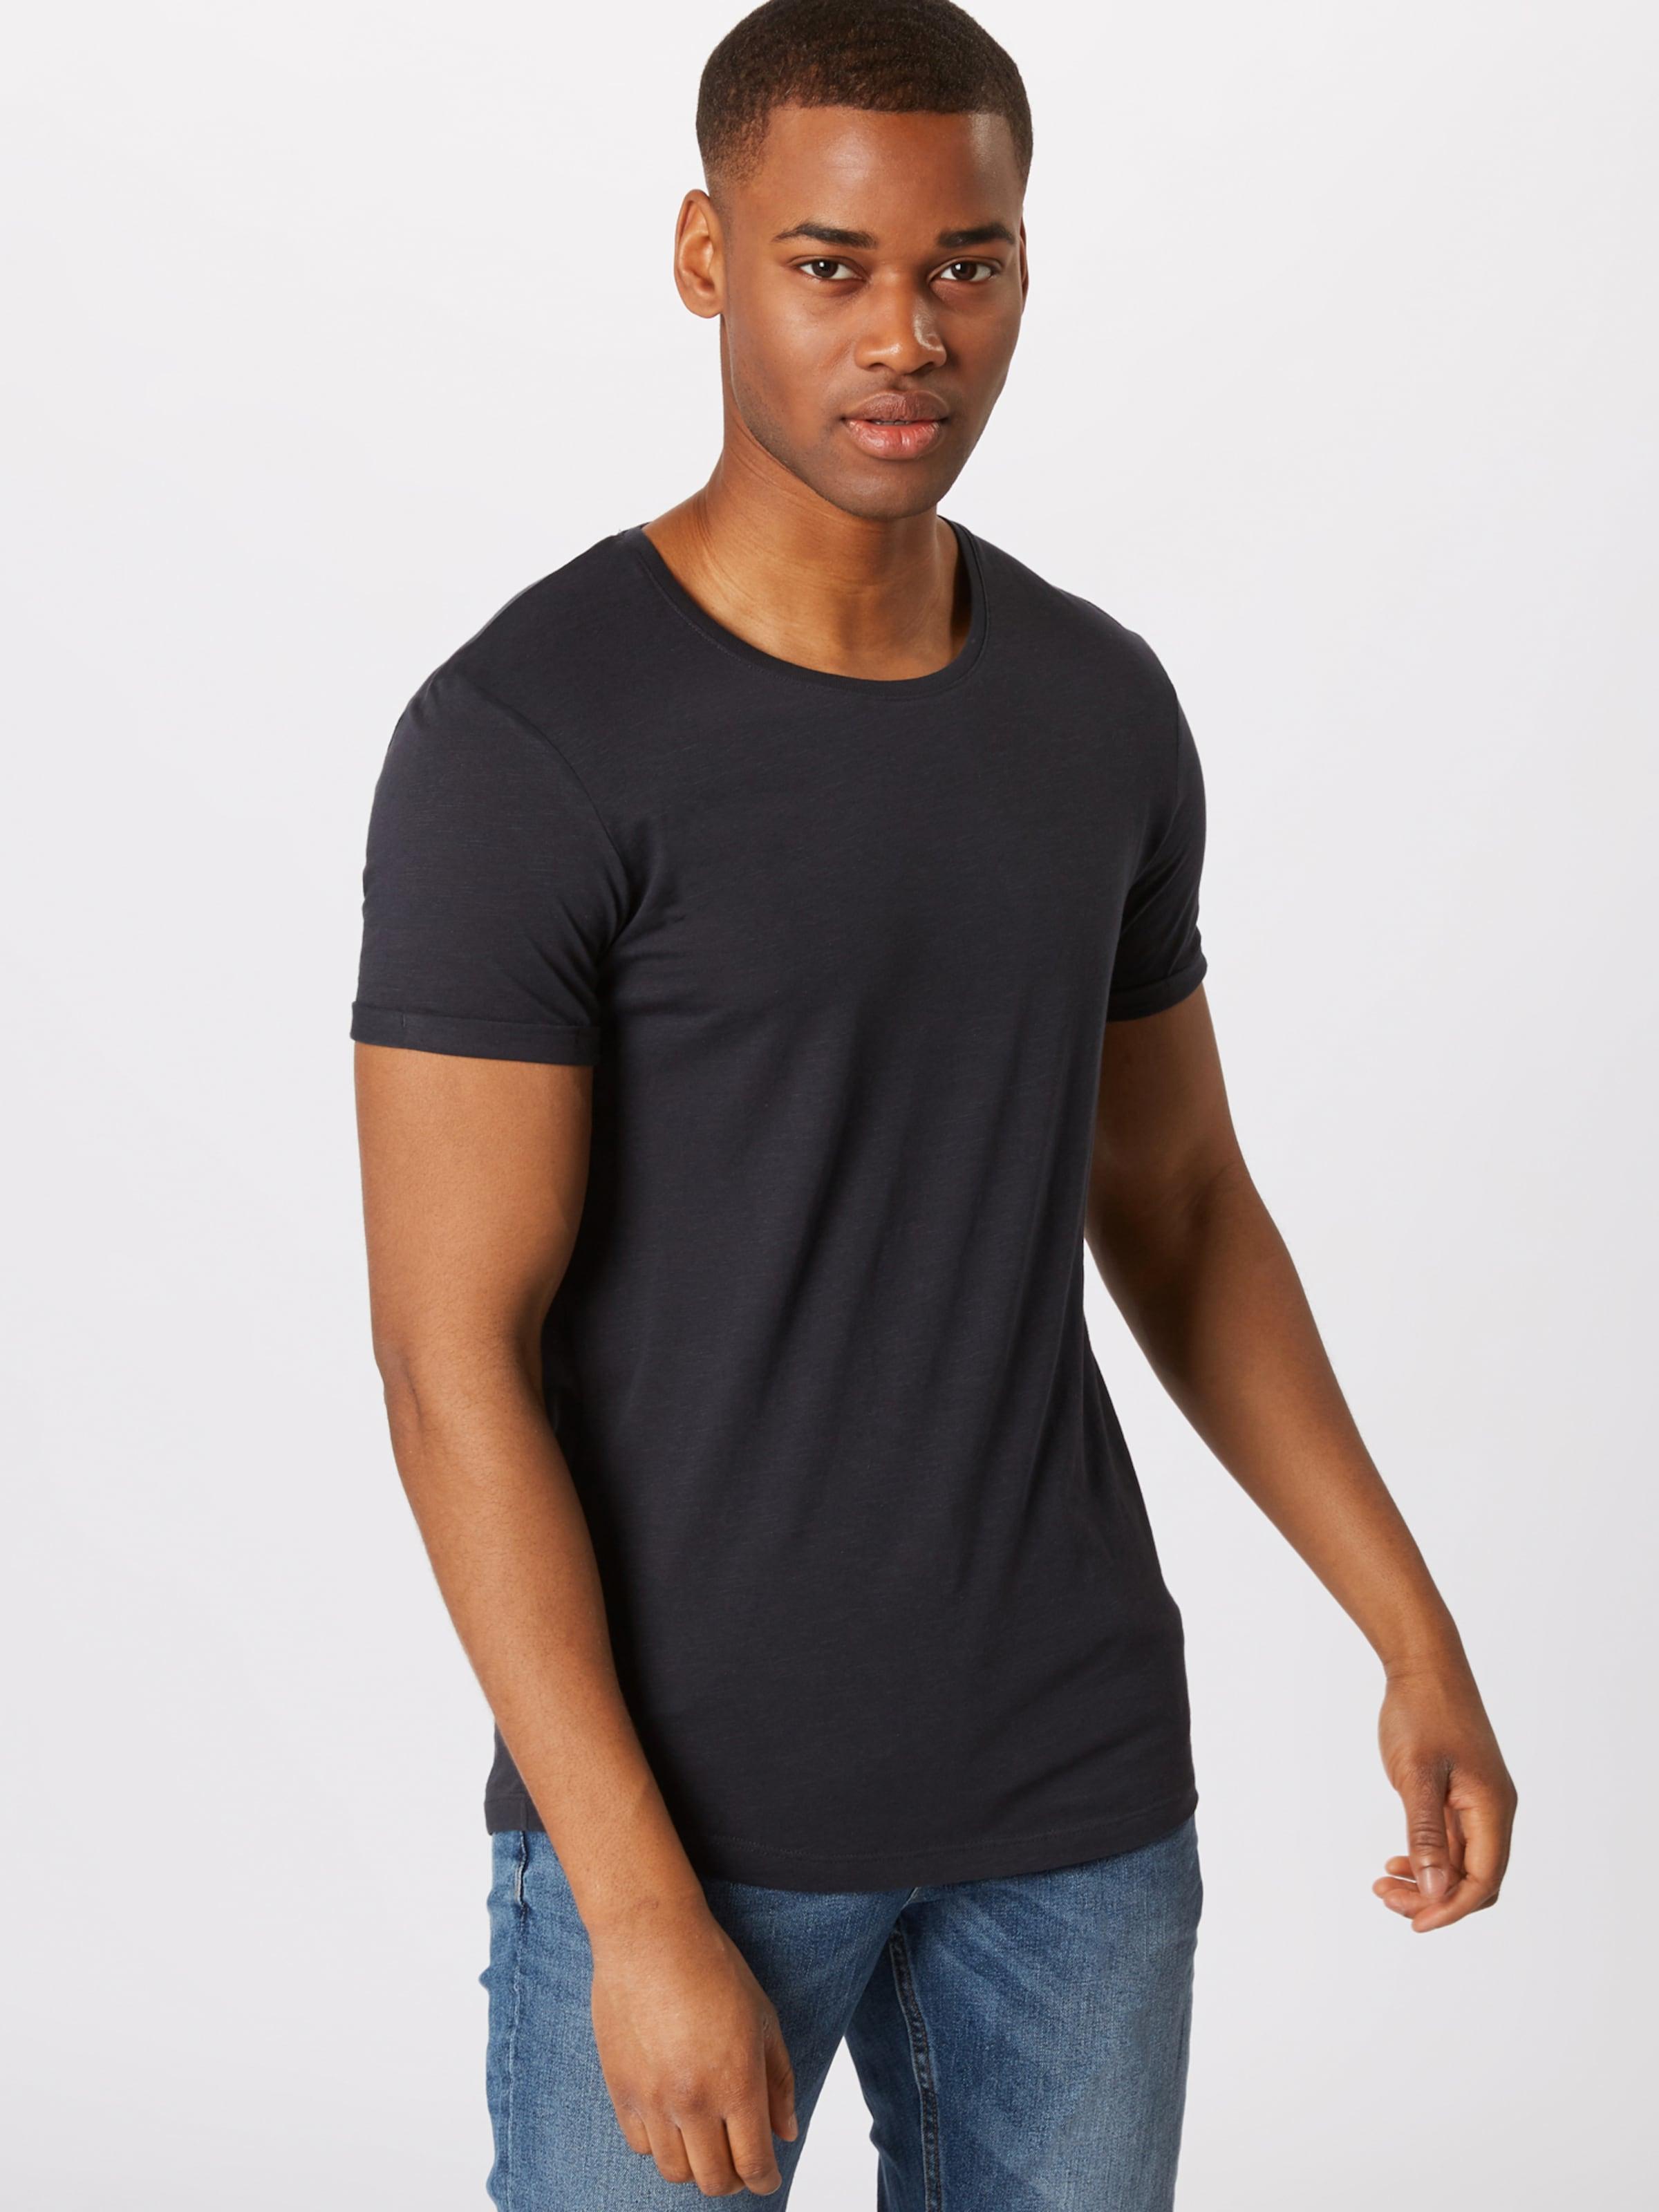 En By shirt Edc Esprit Anthracite T XuTOiwPZlk